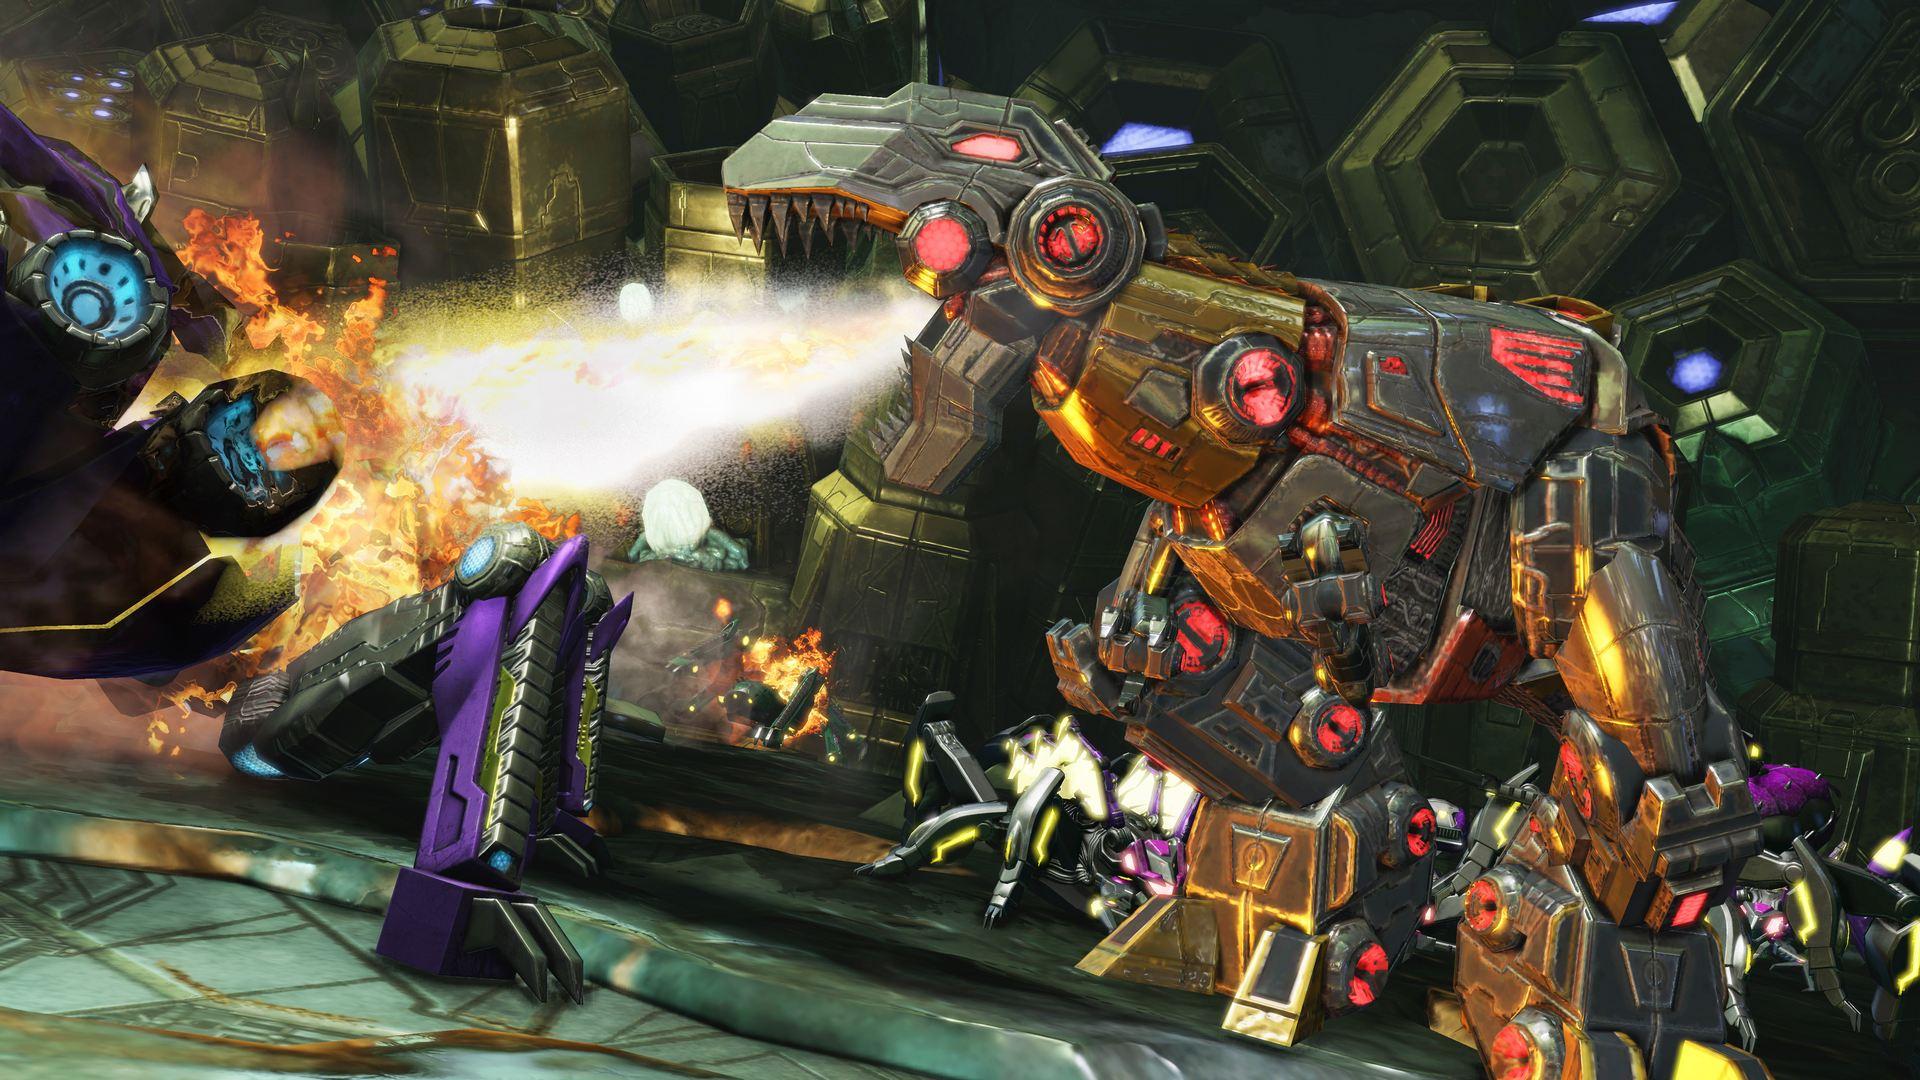 http://www.tfw2005.com/transformers-news/attach/1/Transformers-FOC---Grimlock-fire_7-1920_1334850256.jpg